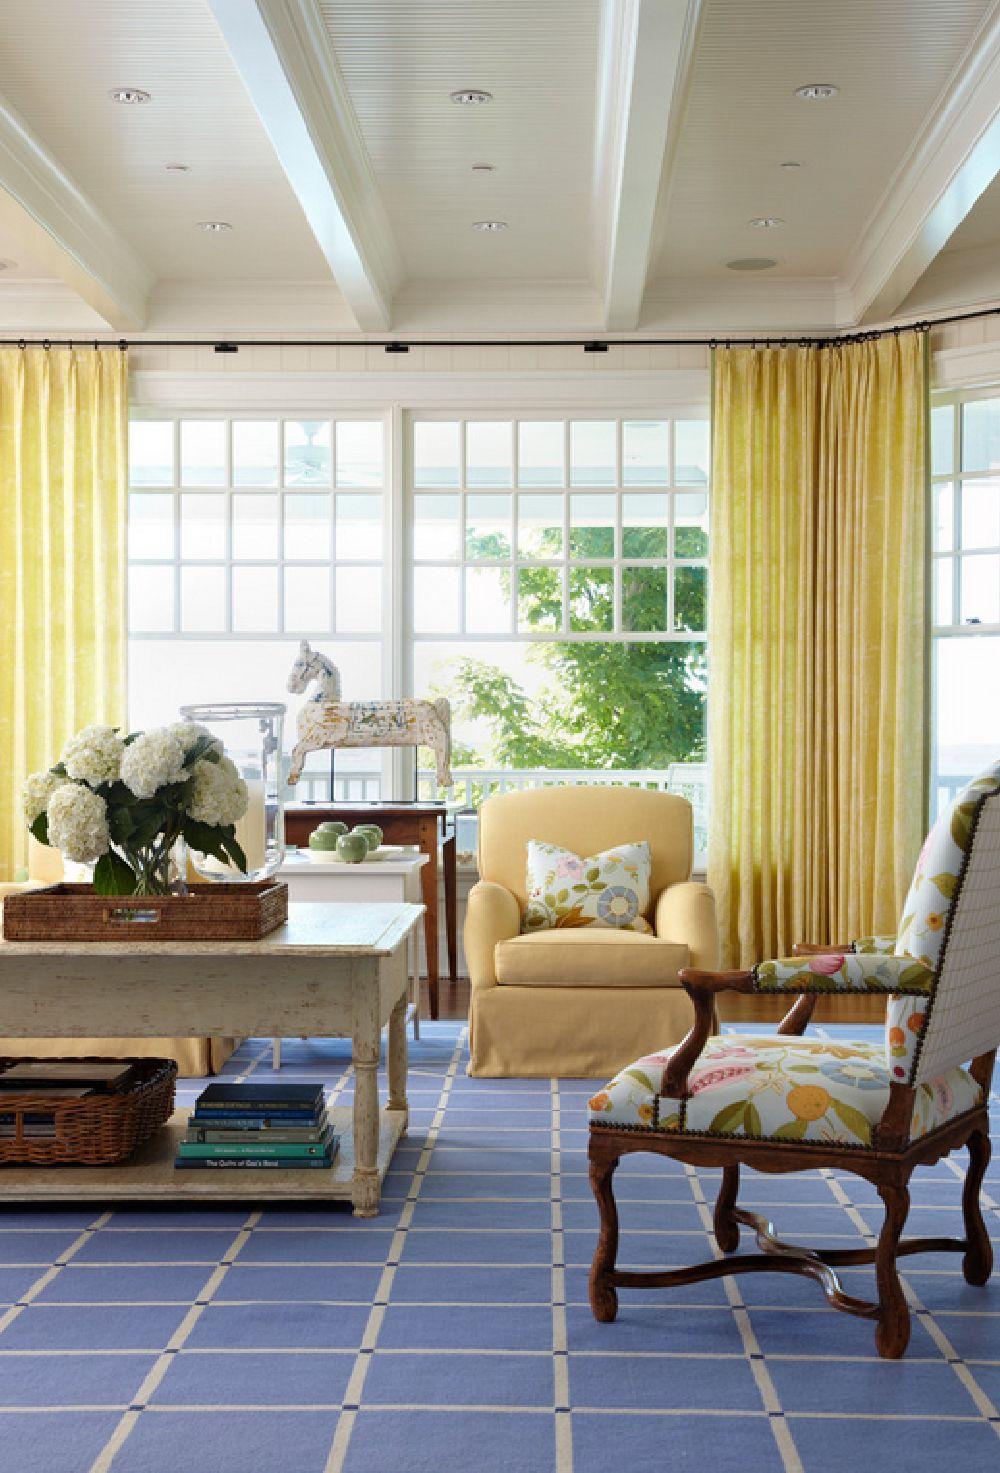 adelaparvu.com casa din lemn cu interior in nuante pastelate, casa SUA Michigan, design interior Tom Stringer, Foto Werner Straube (7)